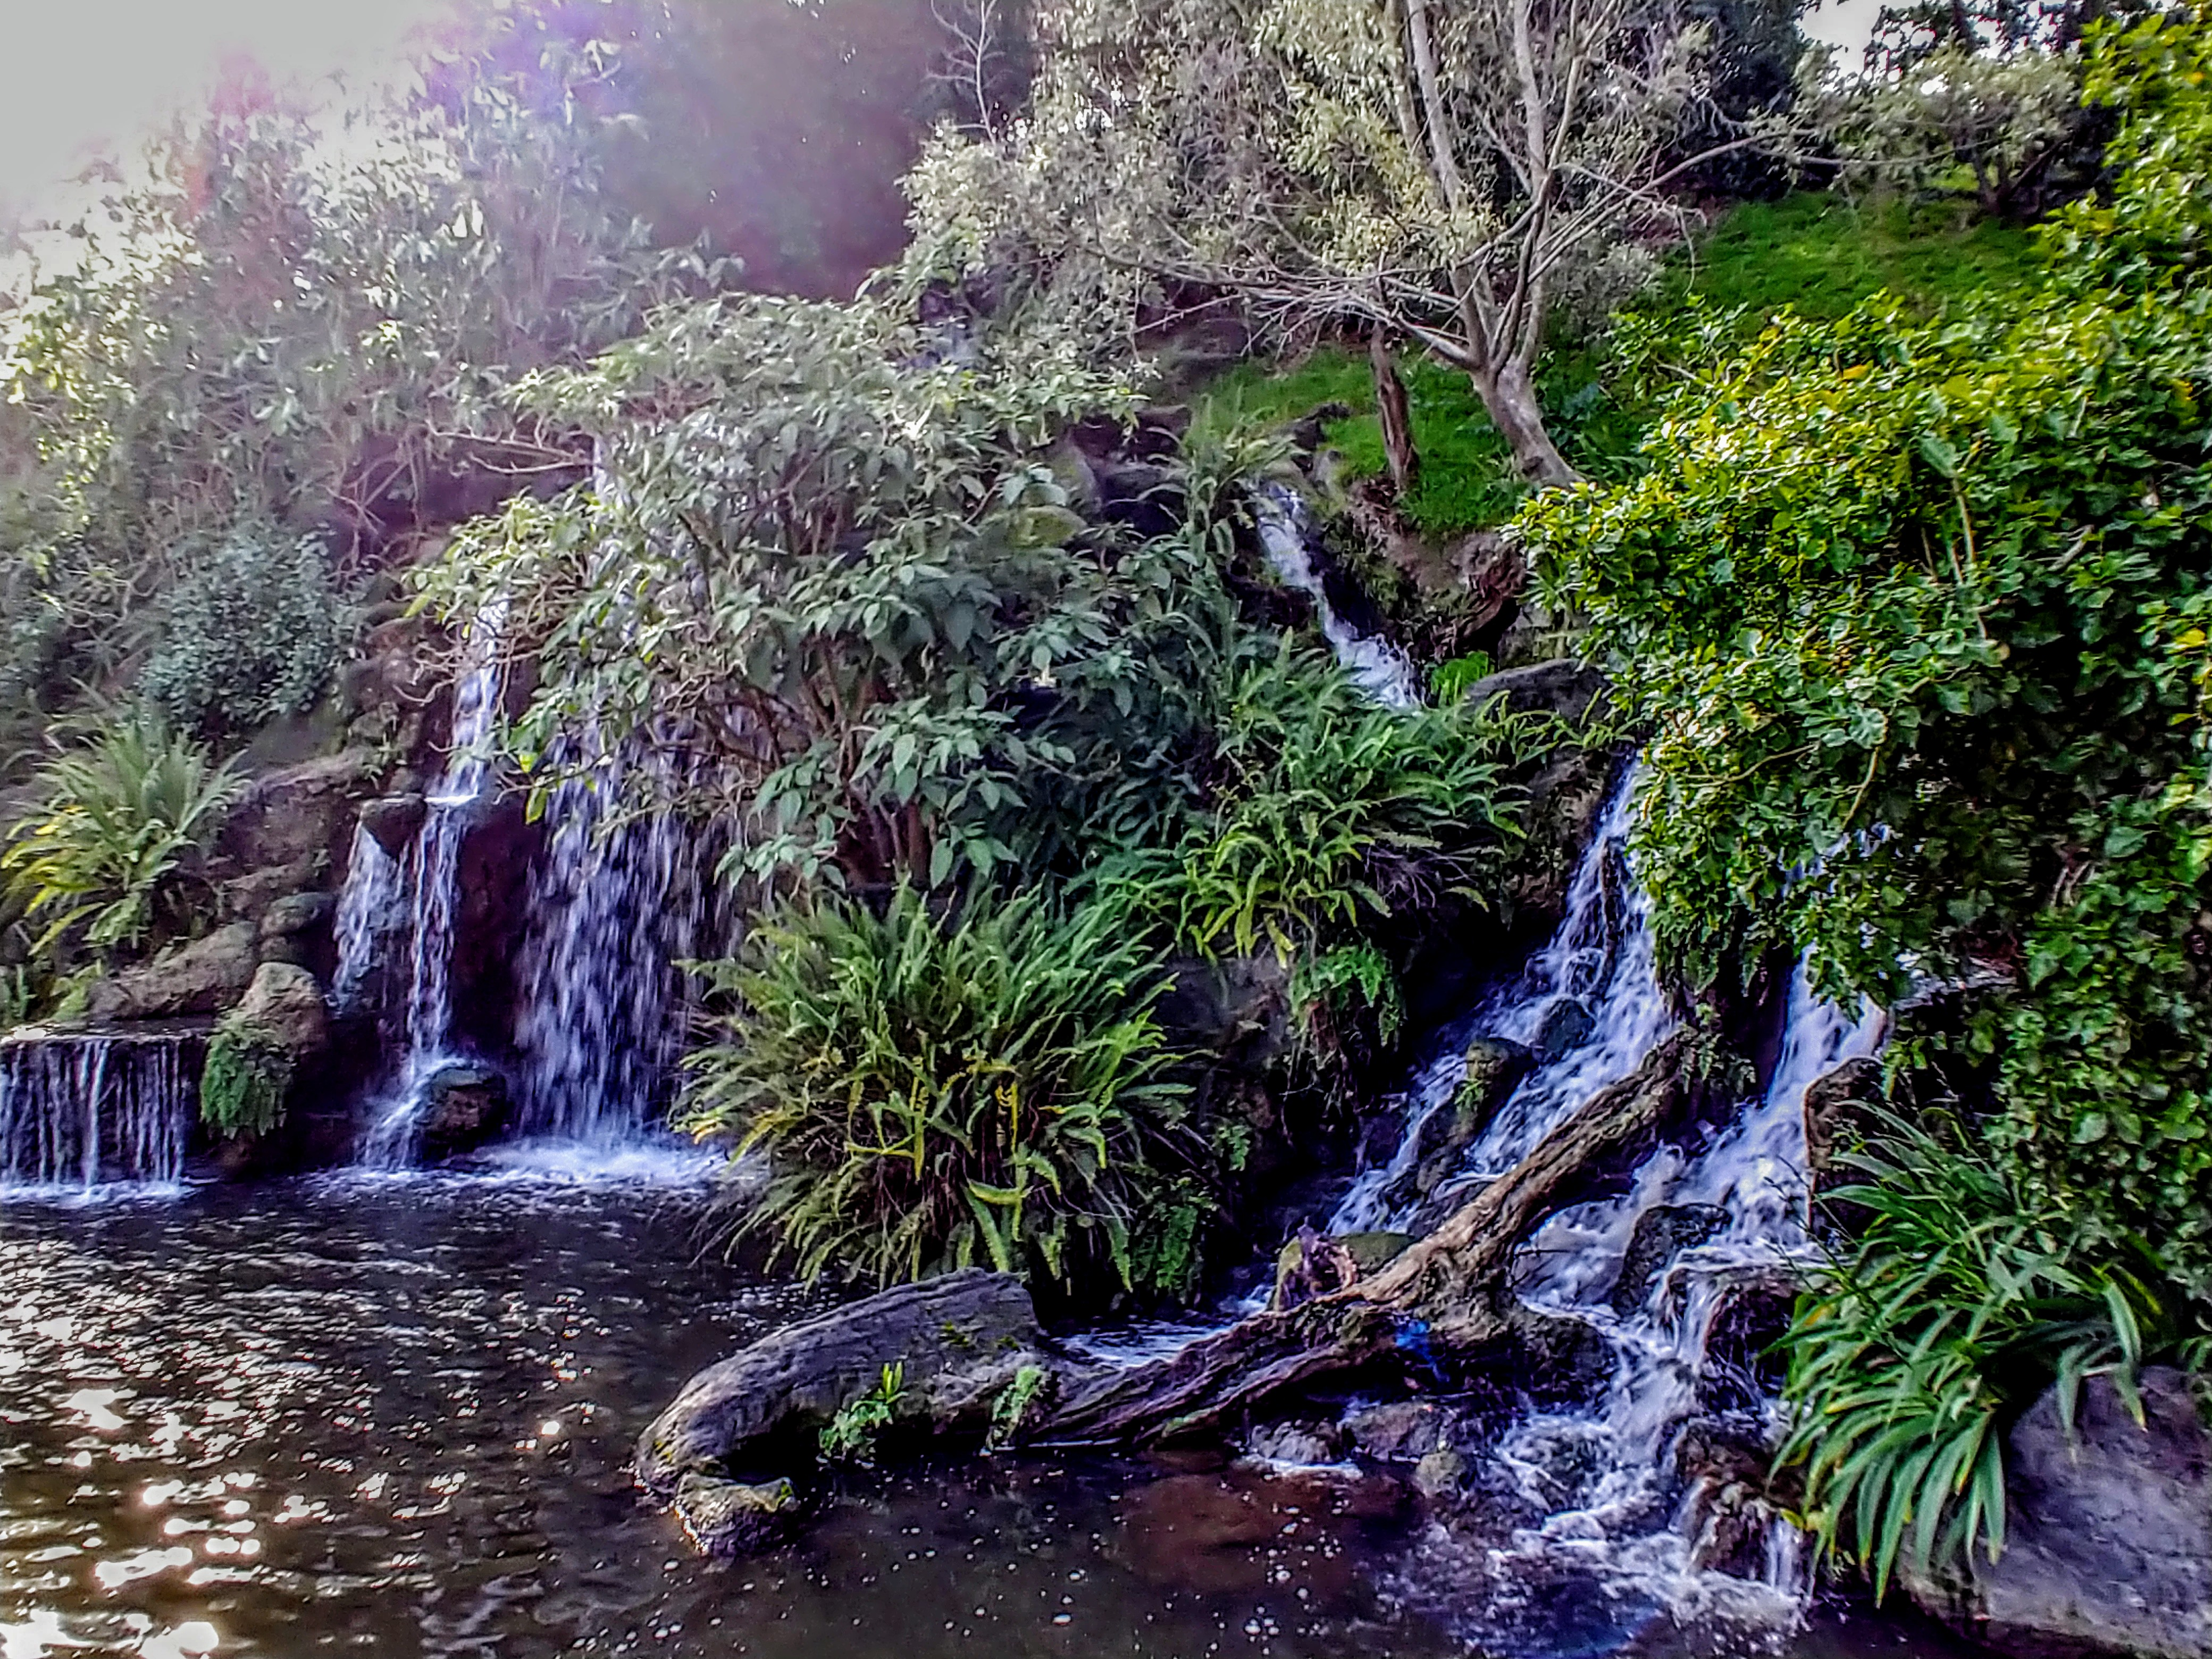 Waterfall at the LA Arboretum